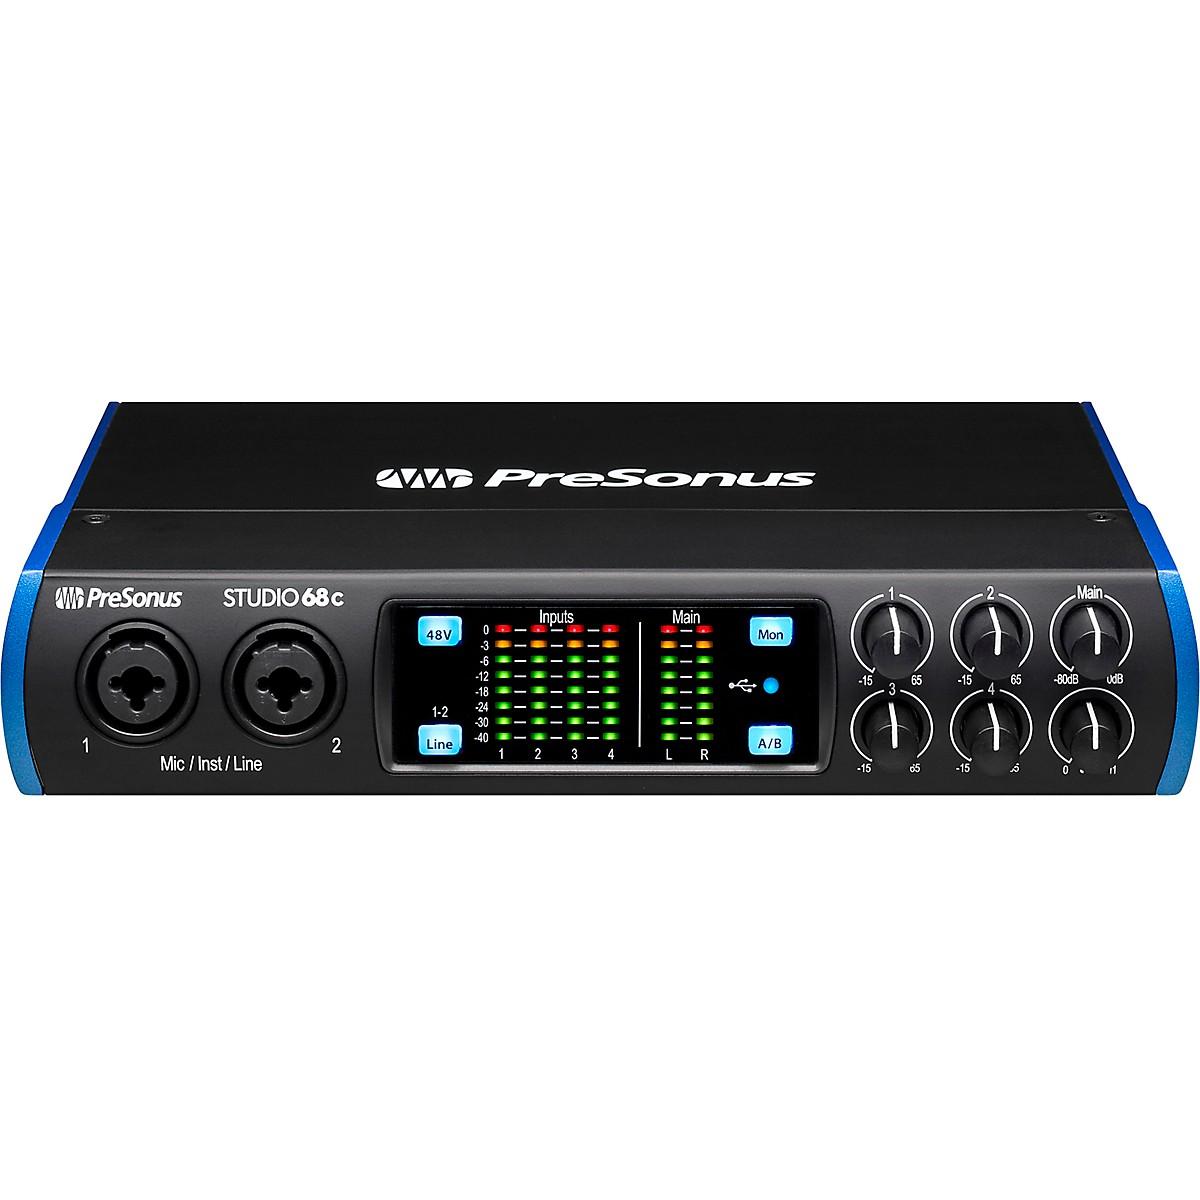 4 XMAX Mic Preamps Presonus STUDIO 68C 6x6 USB-C Audio MIDI Recording Interface